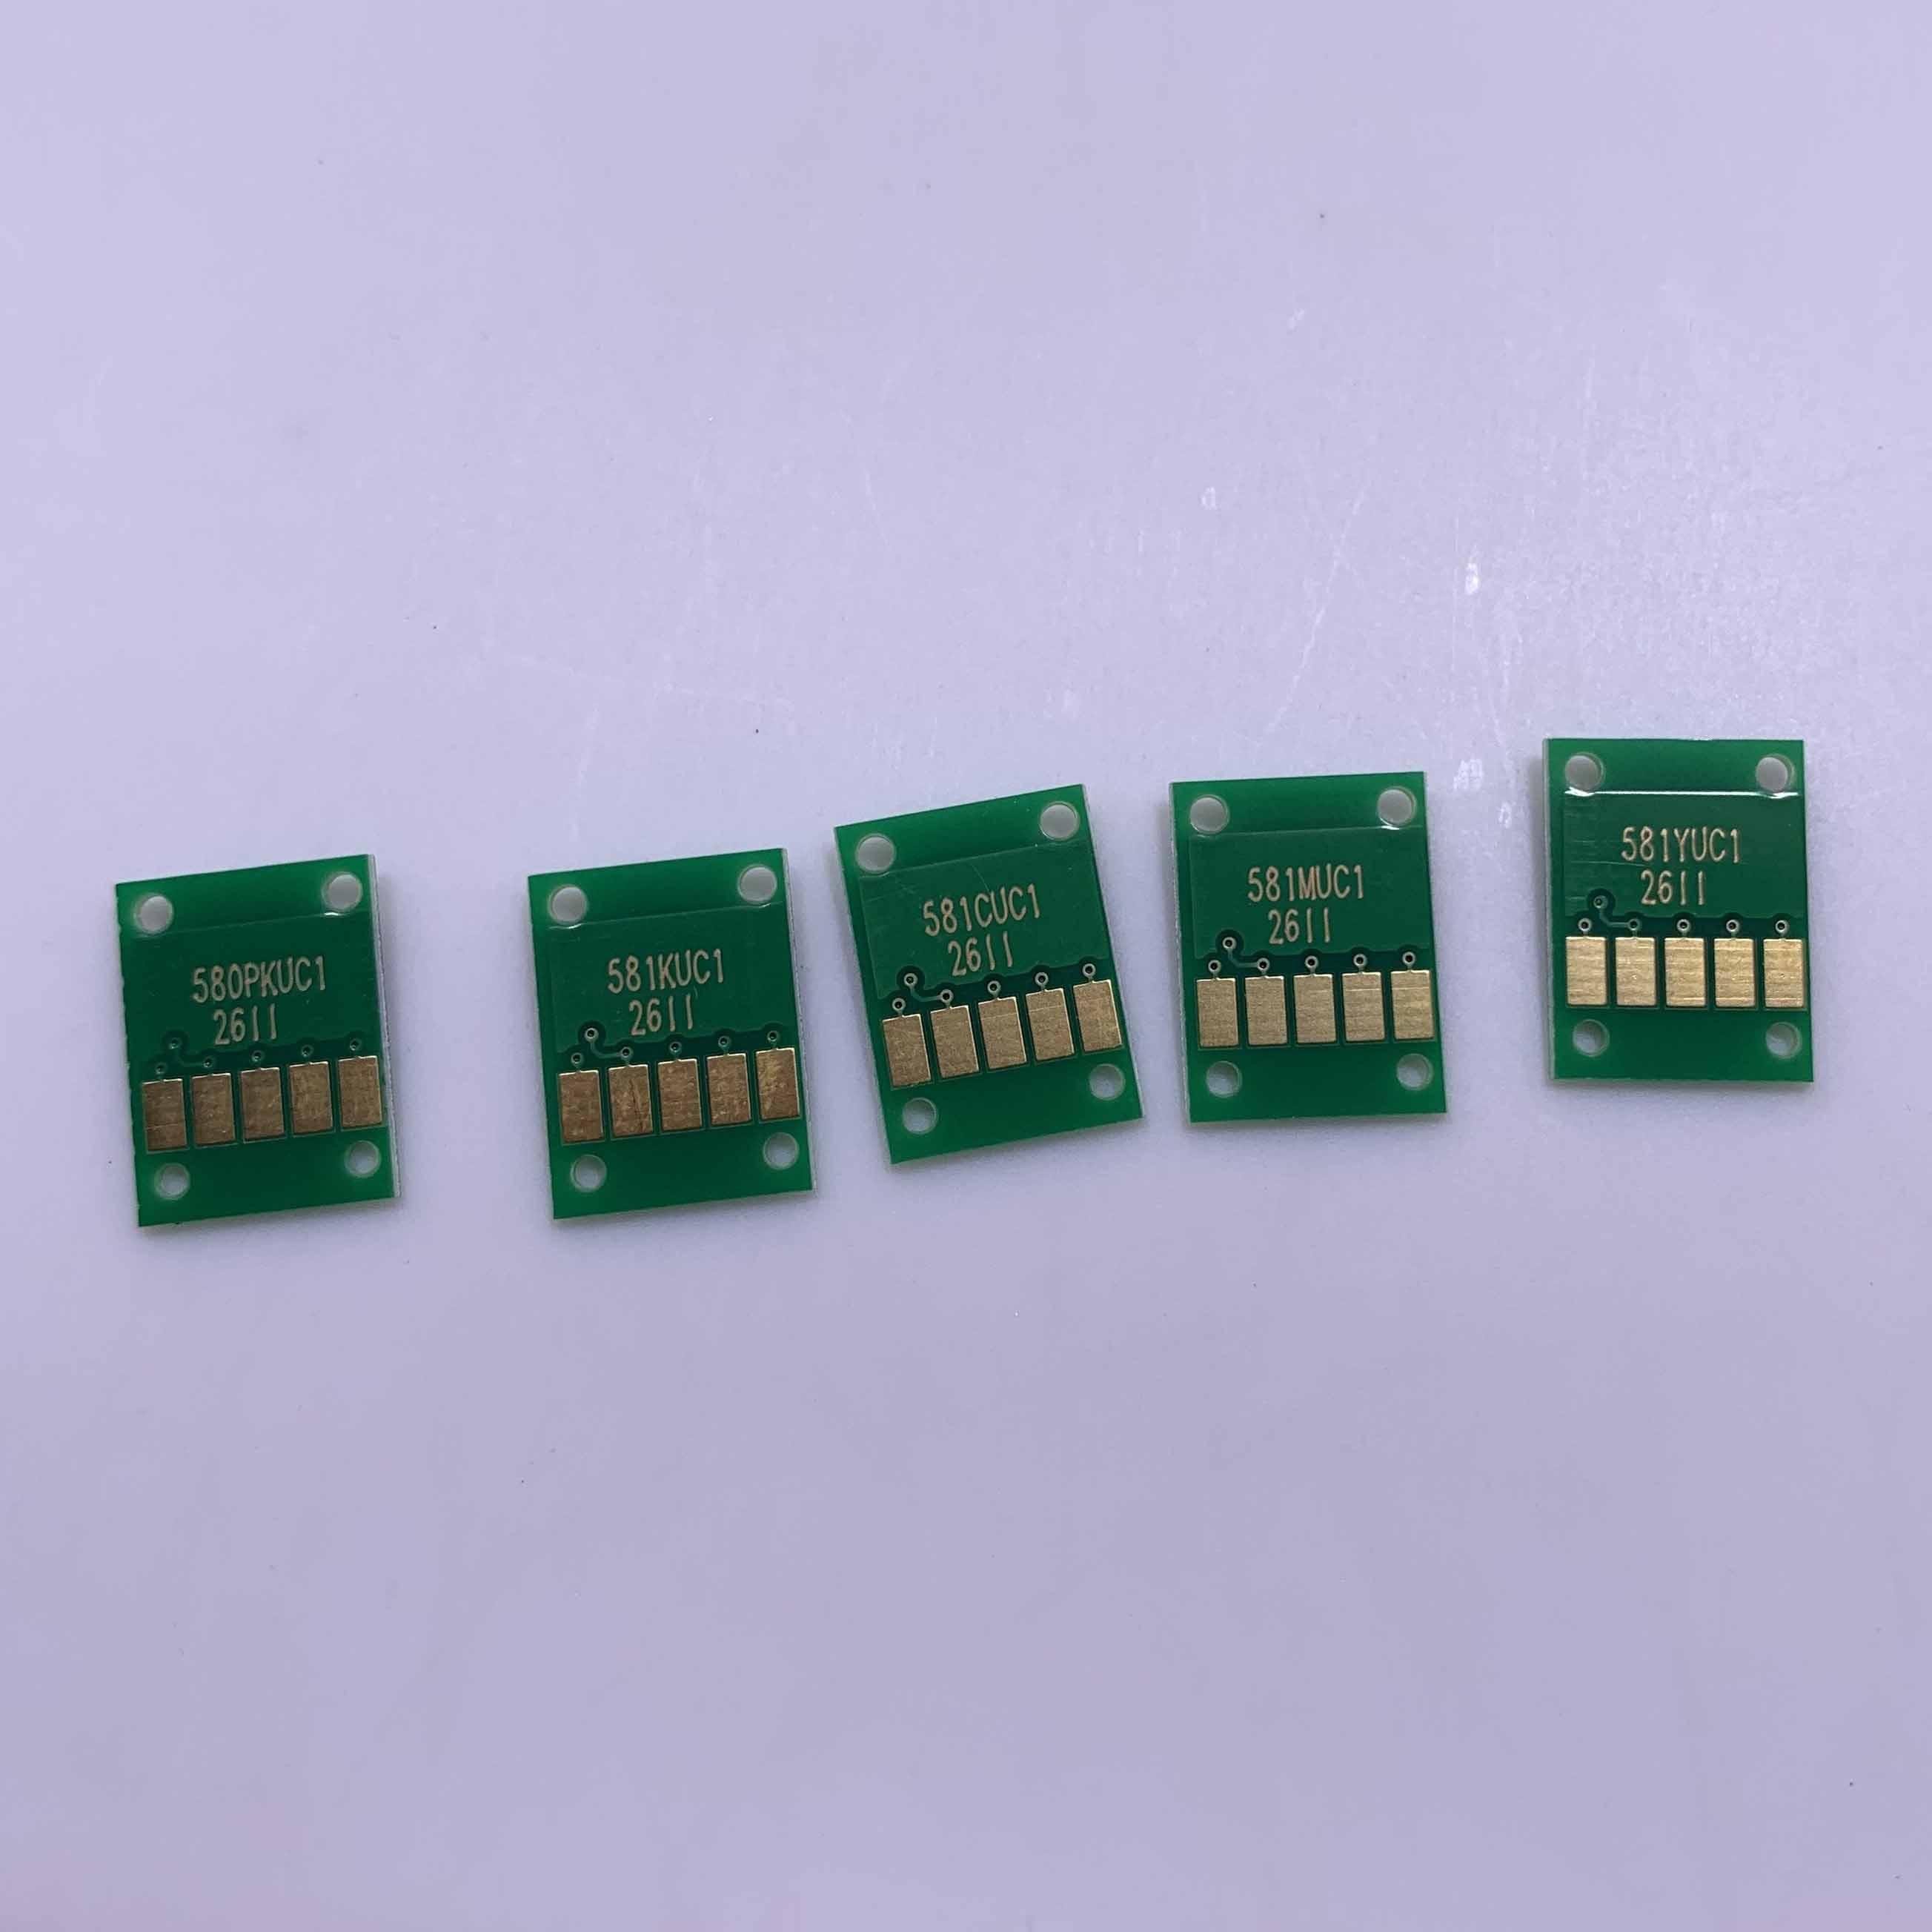 YOTAT PGI-580XL Permanent Chip PGI580 PGI-580 CLI-581 For Canon PIXMA TR7550 TR8550 TS6150 TS6151 TS8150 TS8151 TS8152 TS9150